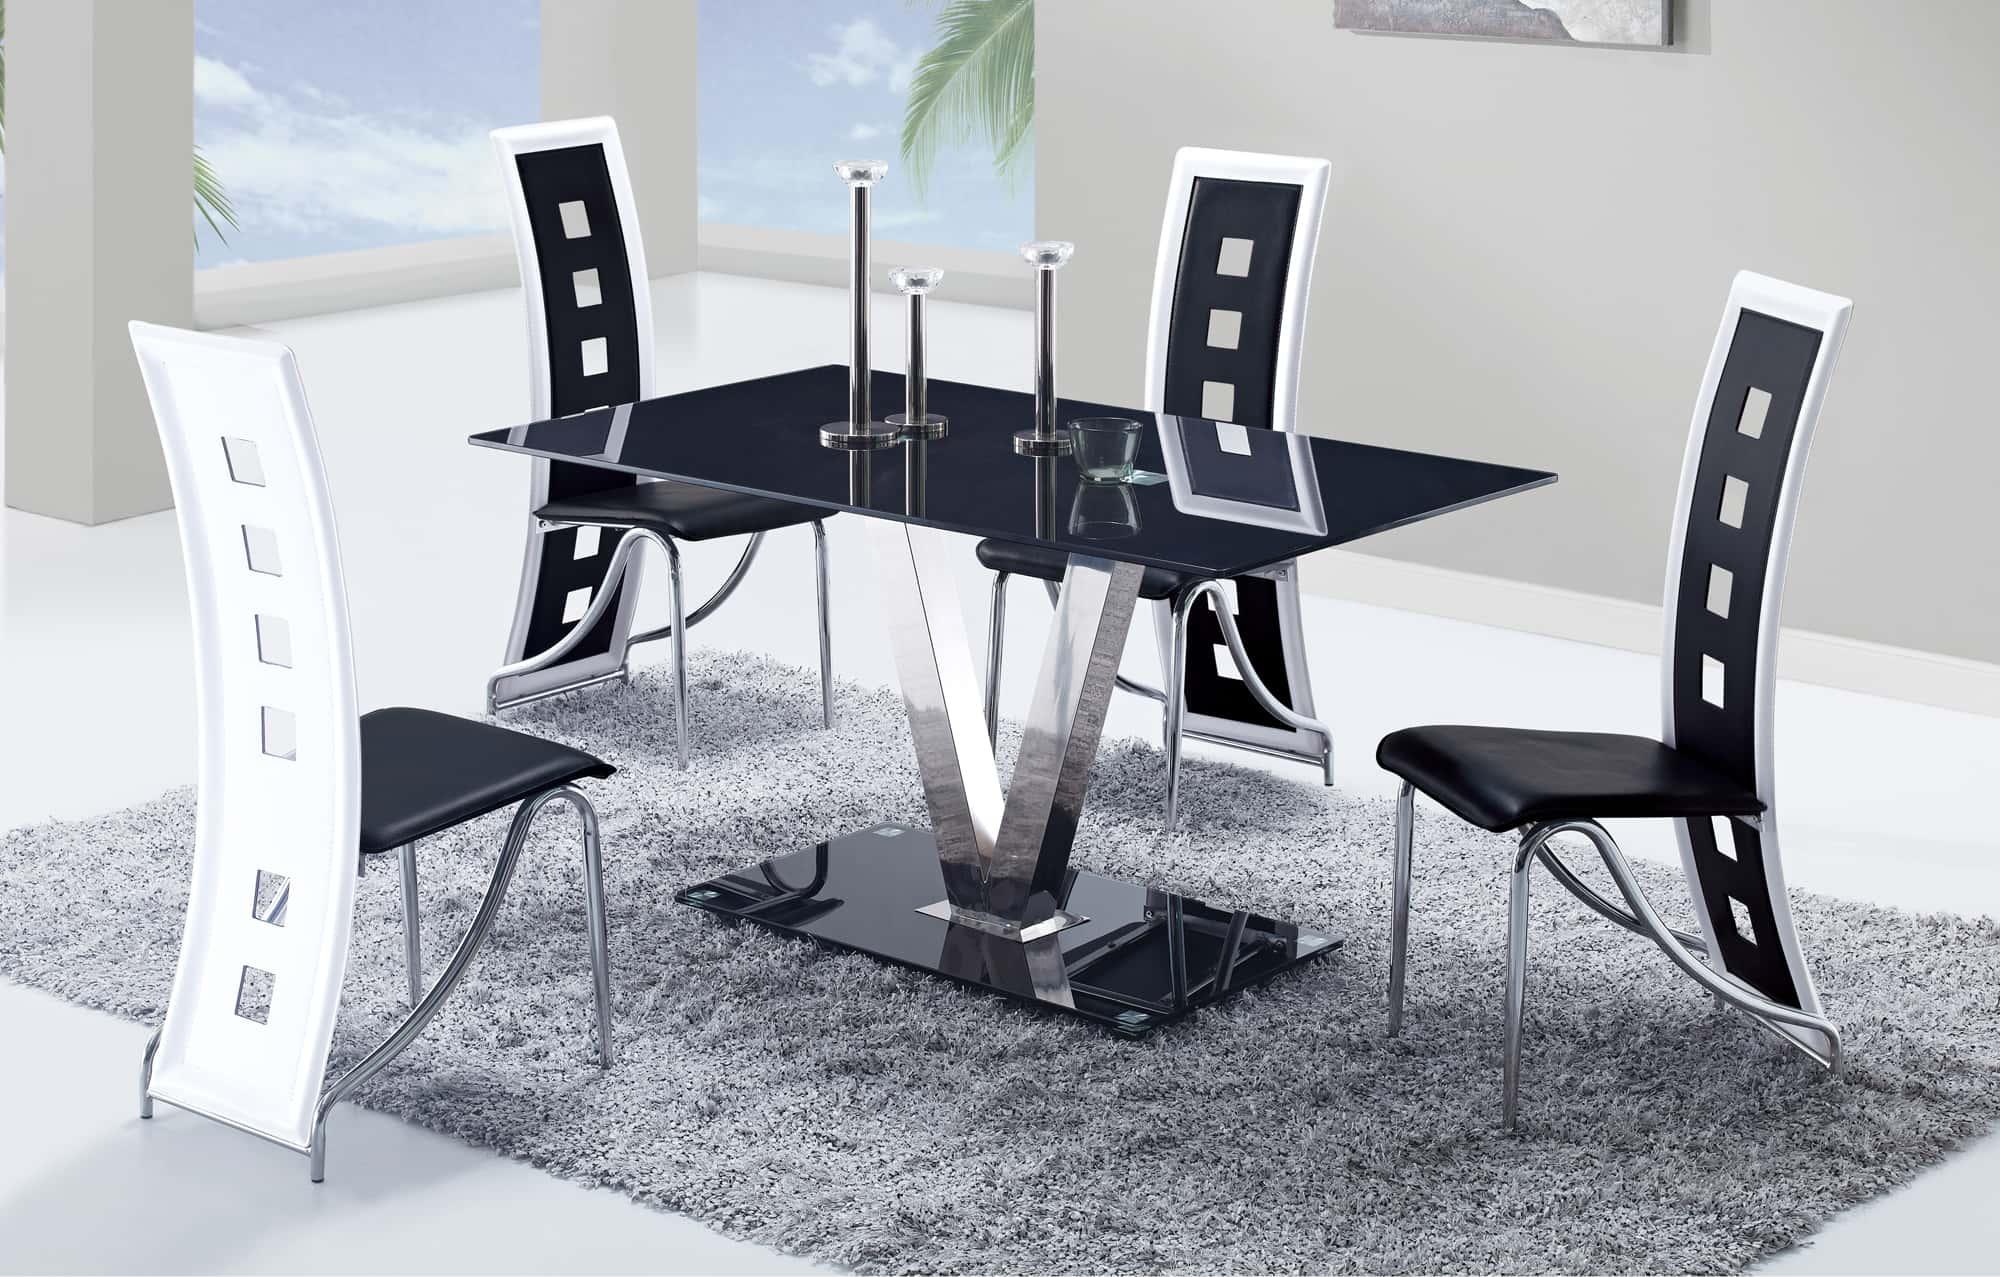 dining table d551dt silver black glass by global furniture. Black Bedroom Furniture Sets. Home Design Ideas